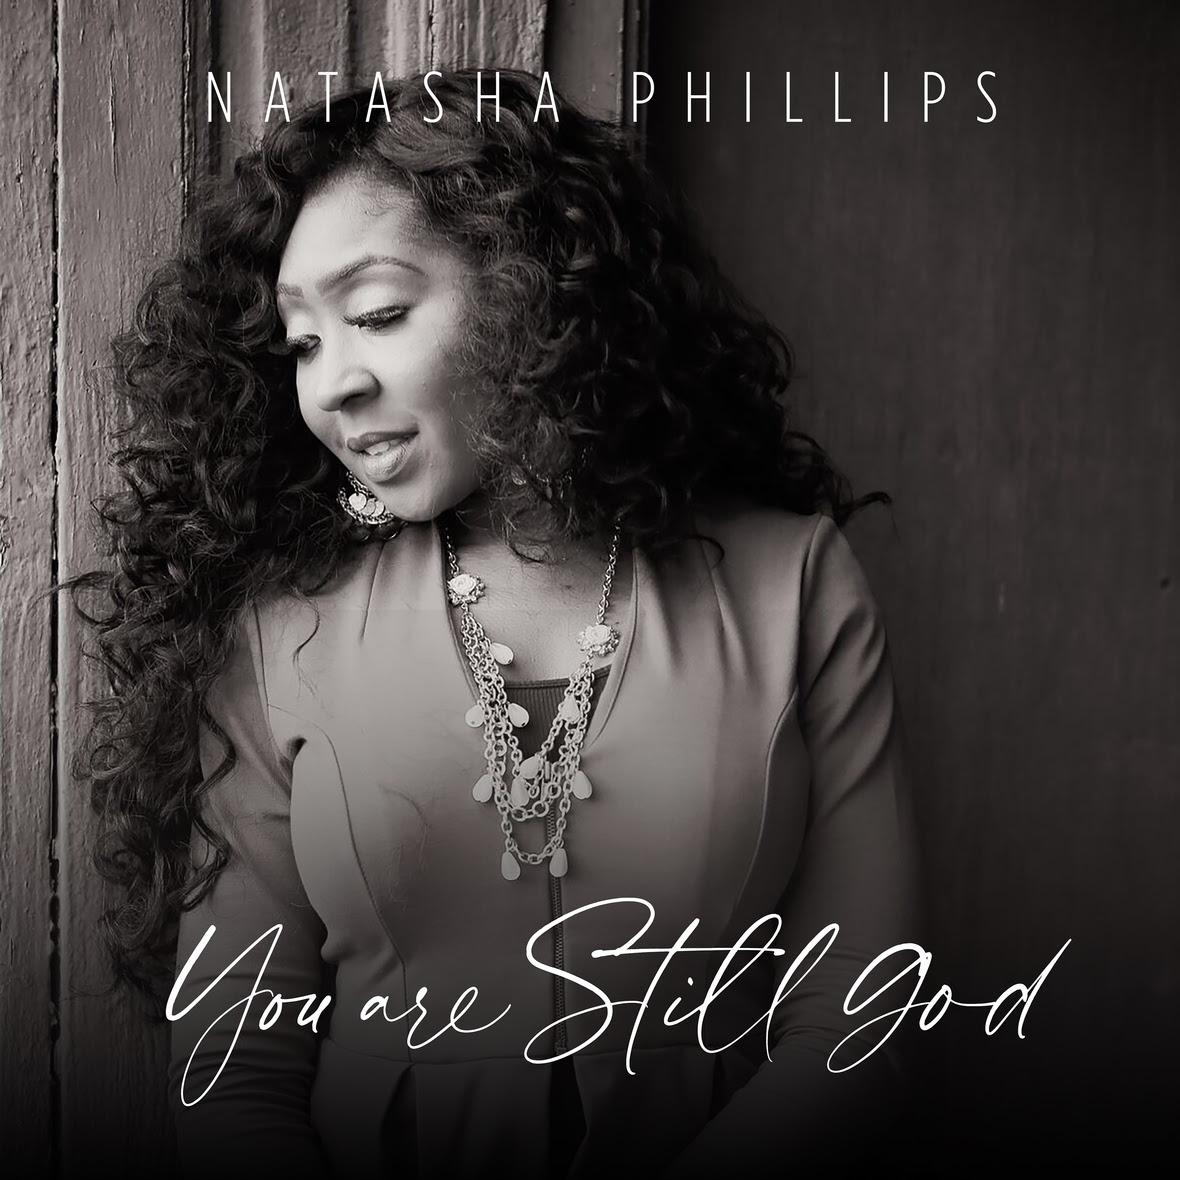 Natasha Phillips - You Are Still God - Cover